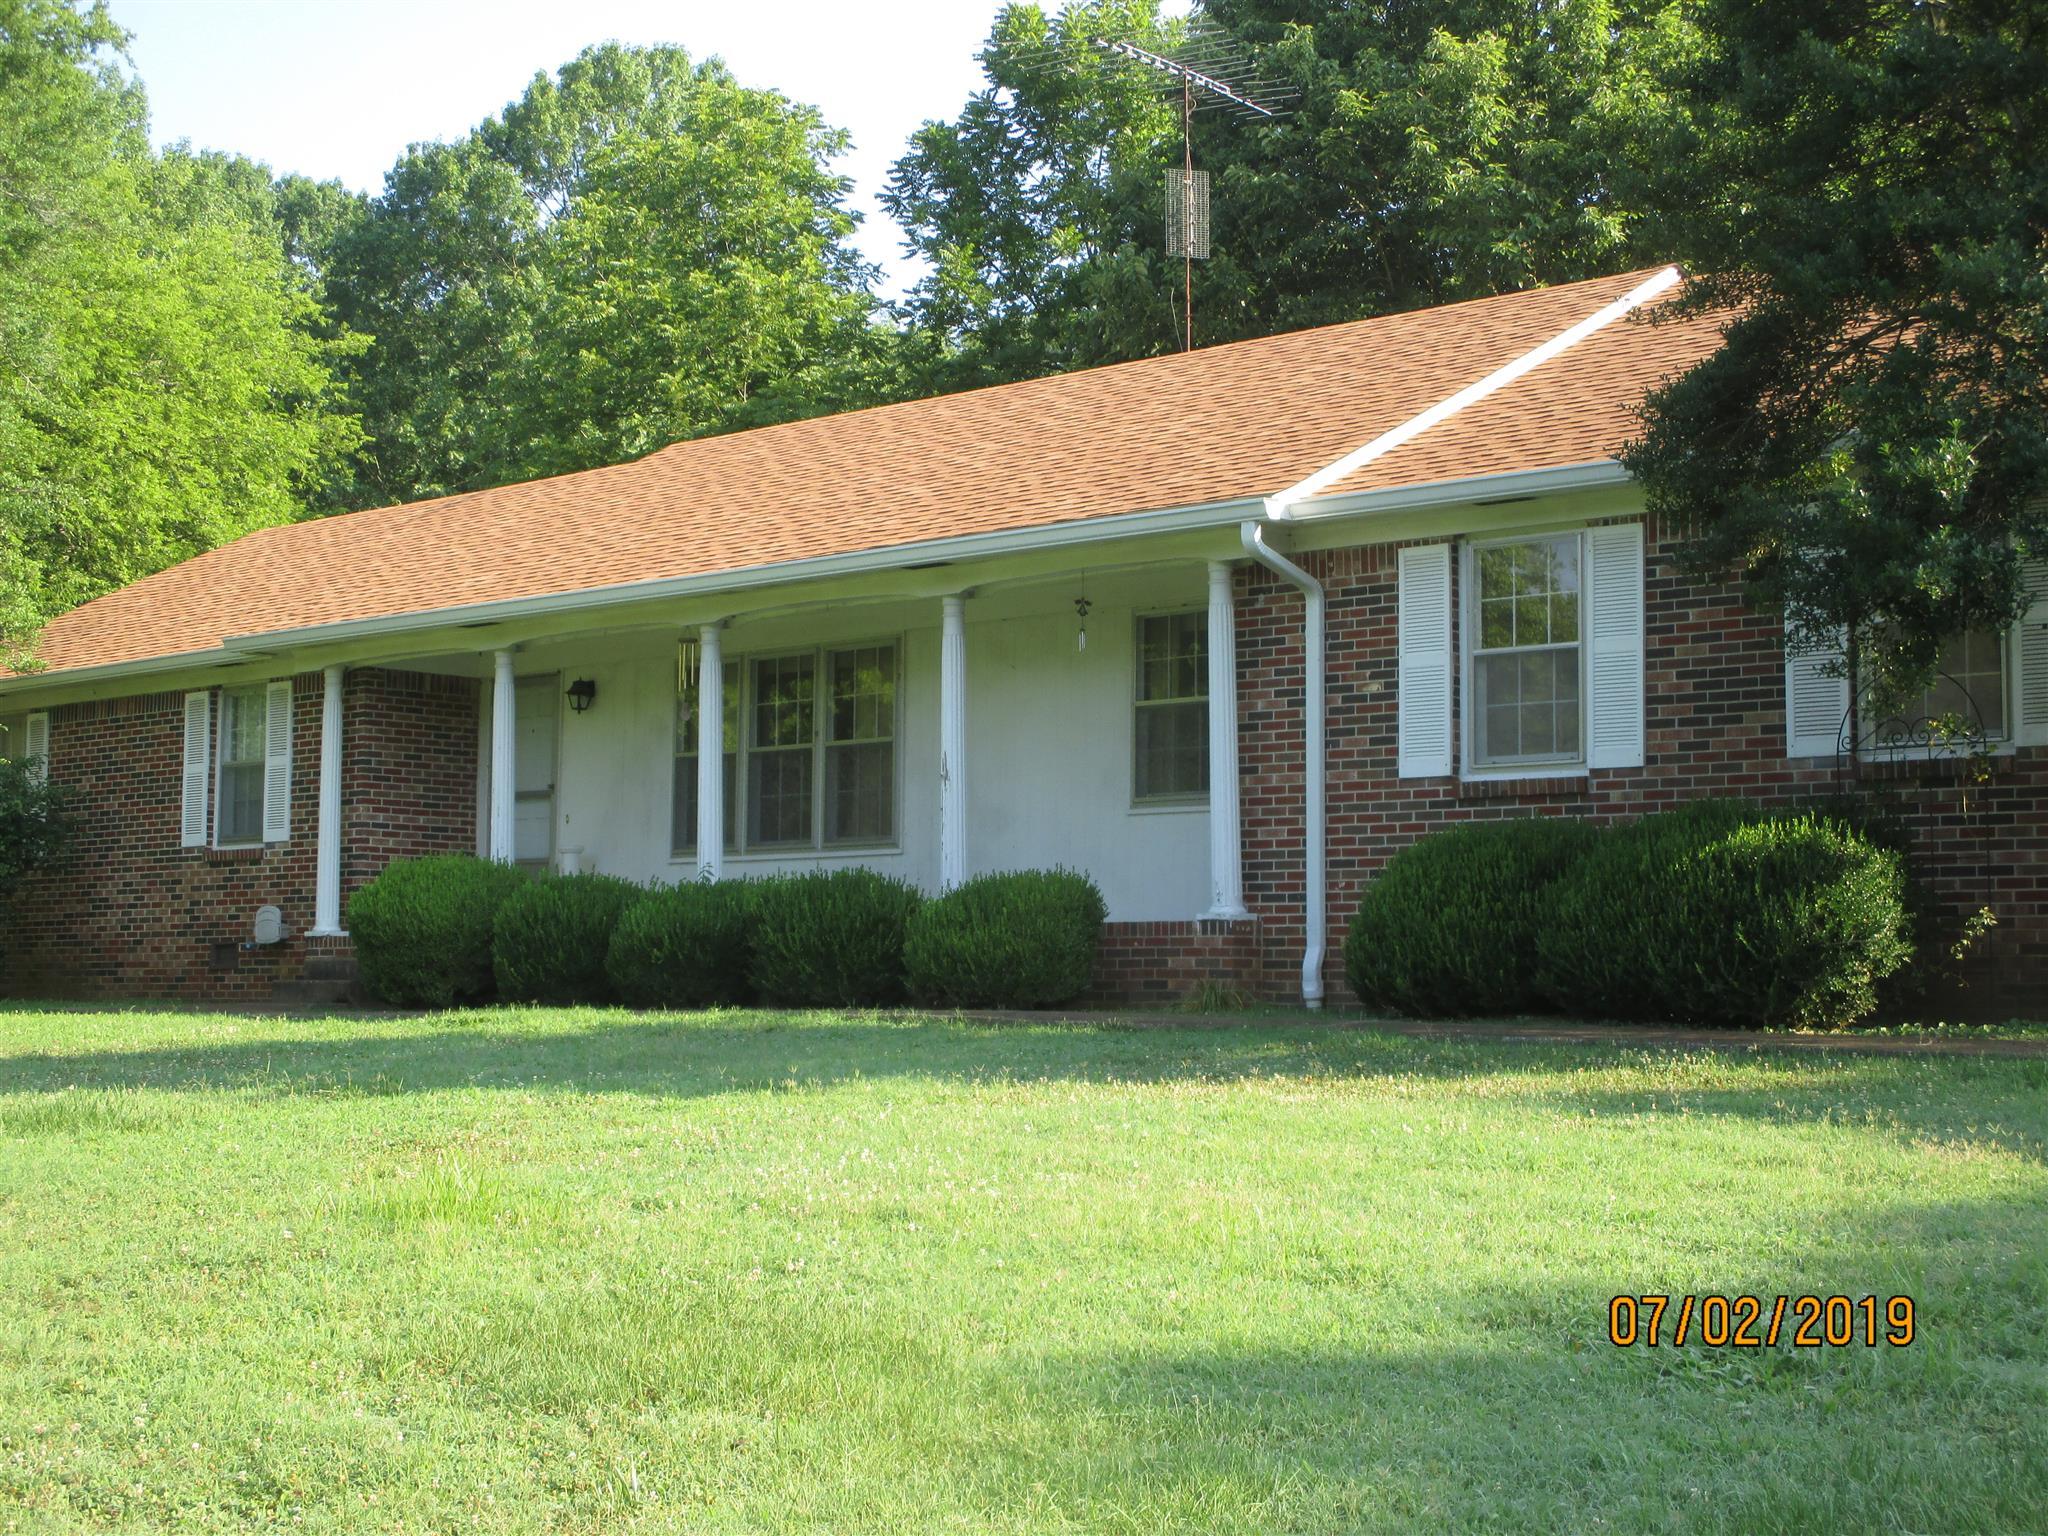 2184 Braly Lane, Pulaski, TN 38478 - Pulaski, TN real estate listing